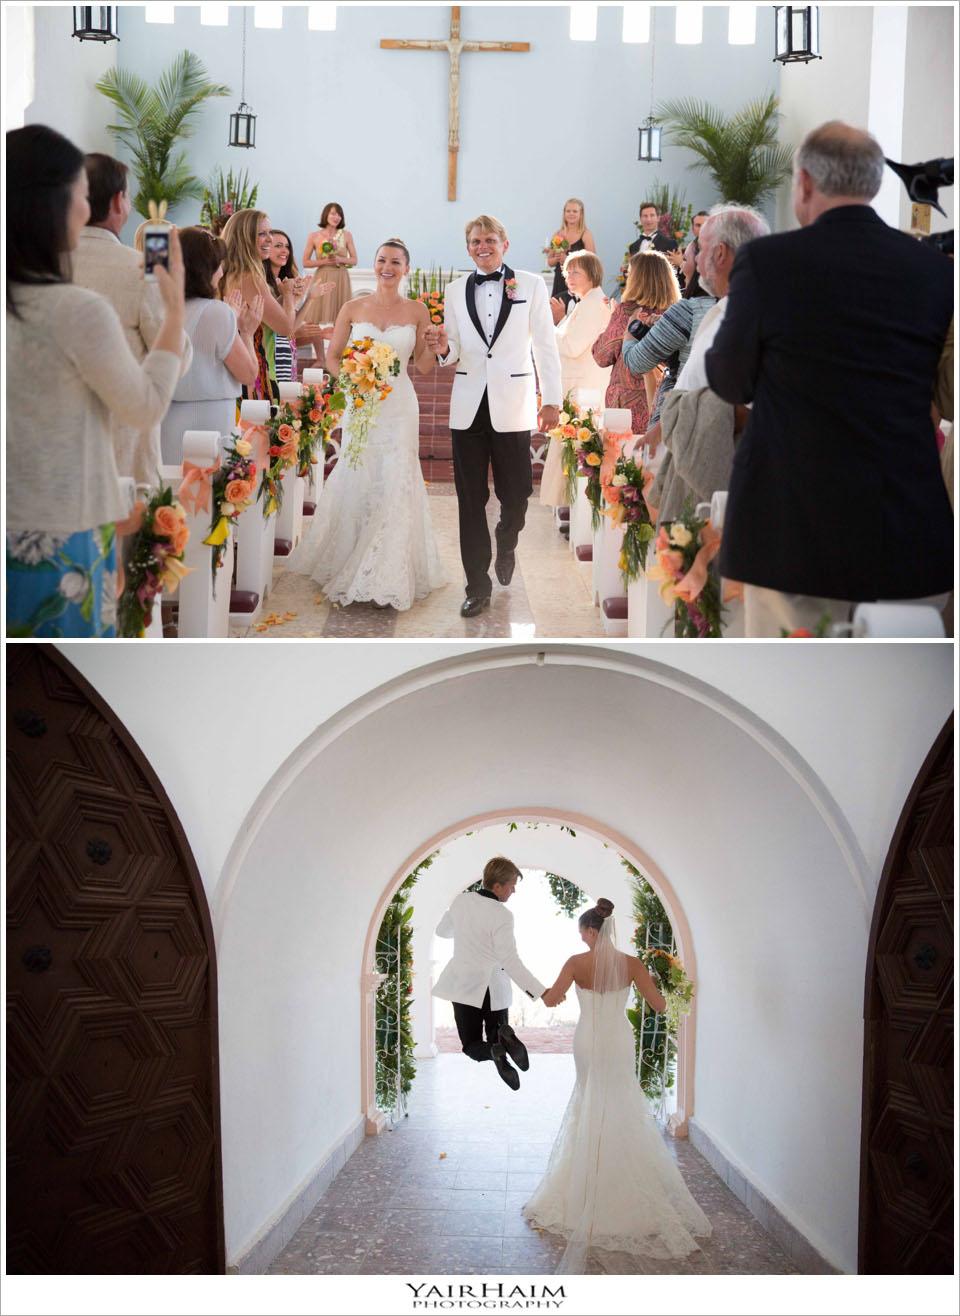 Destination-wedding-photographer-yair-haim-15